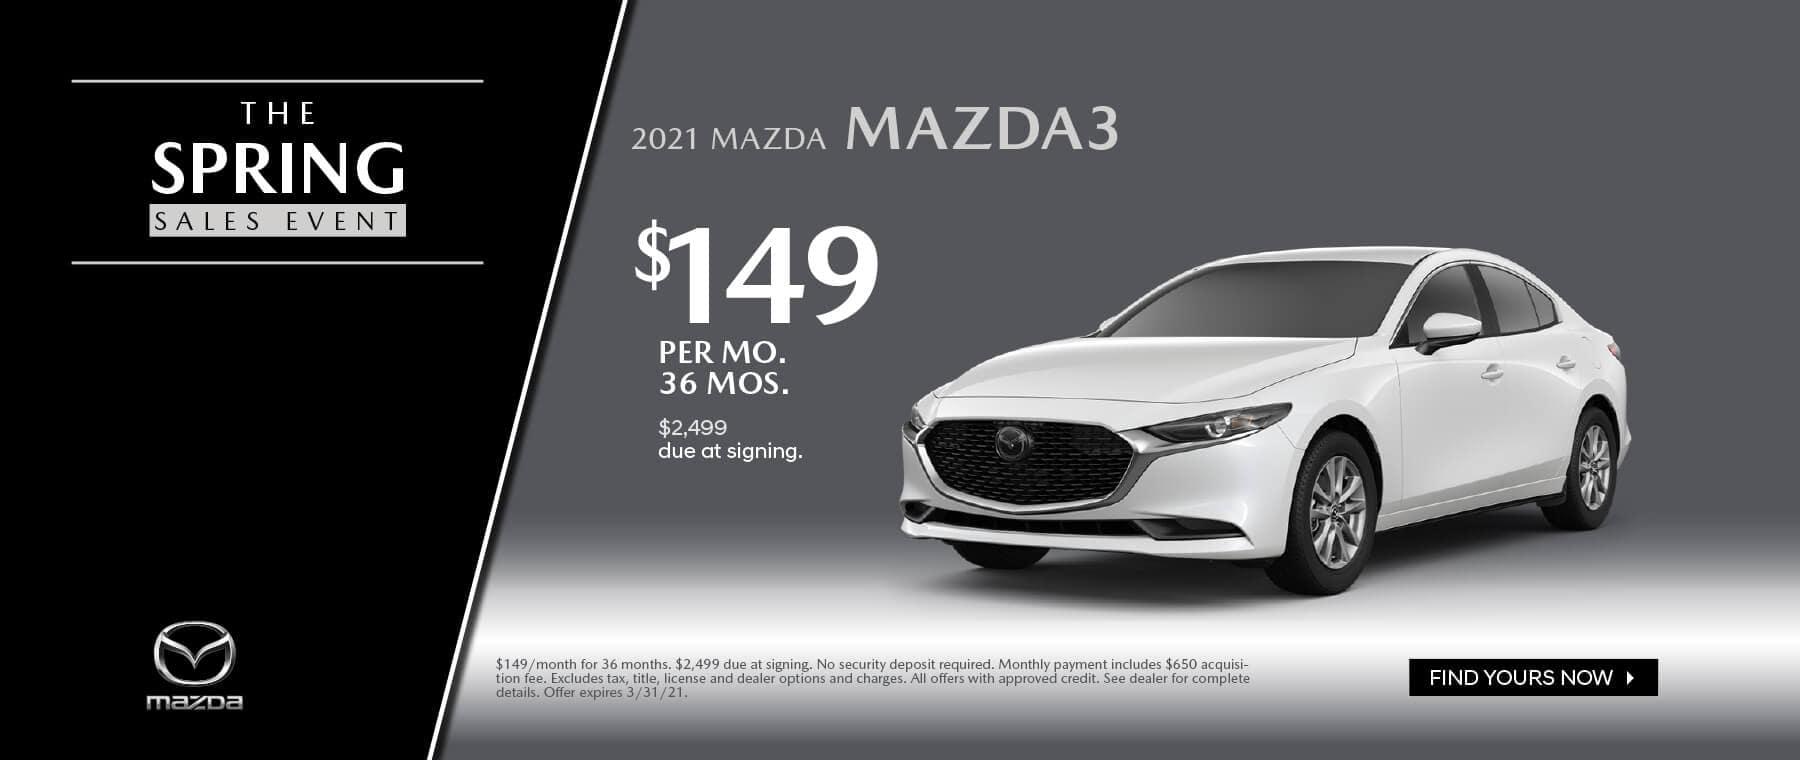 2021.02.24-Keffer-Mazda-MAR-Web-Banners-S51082vw-7